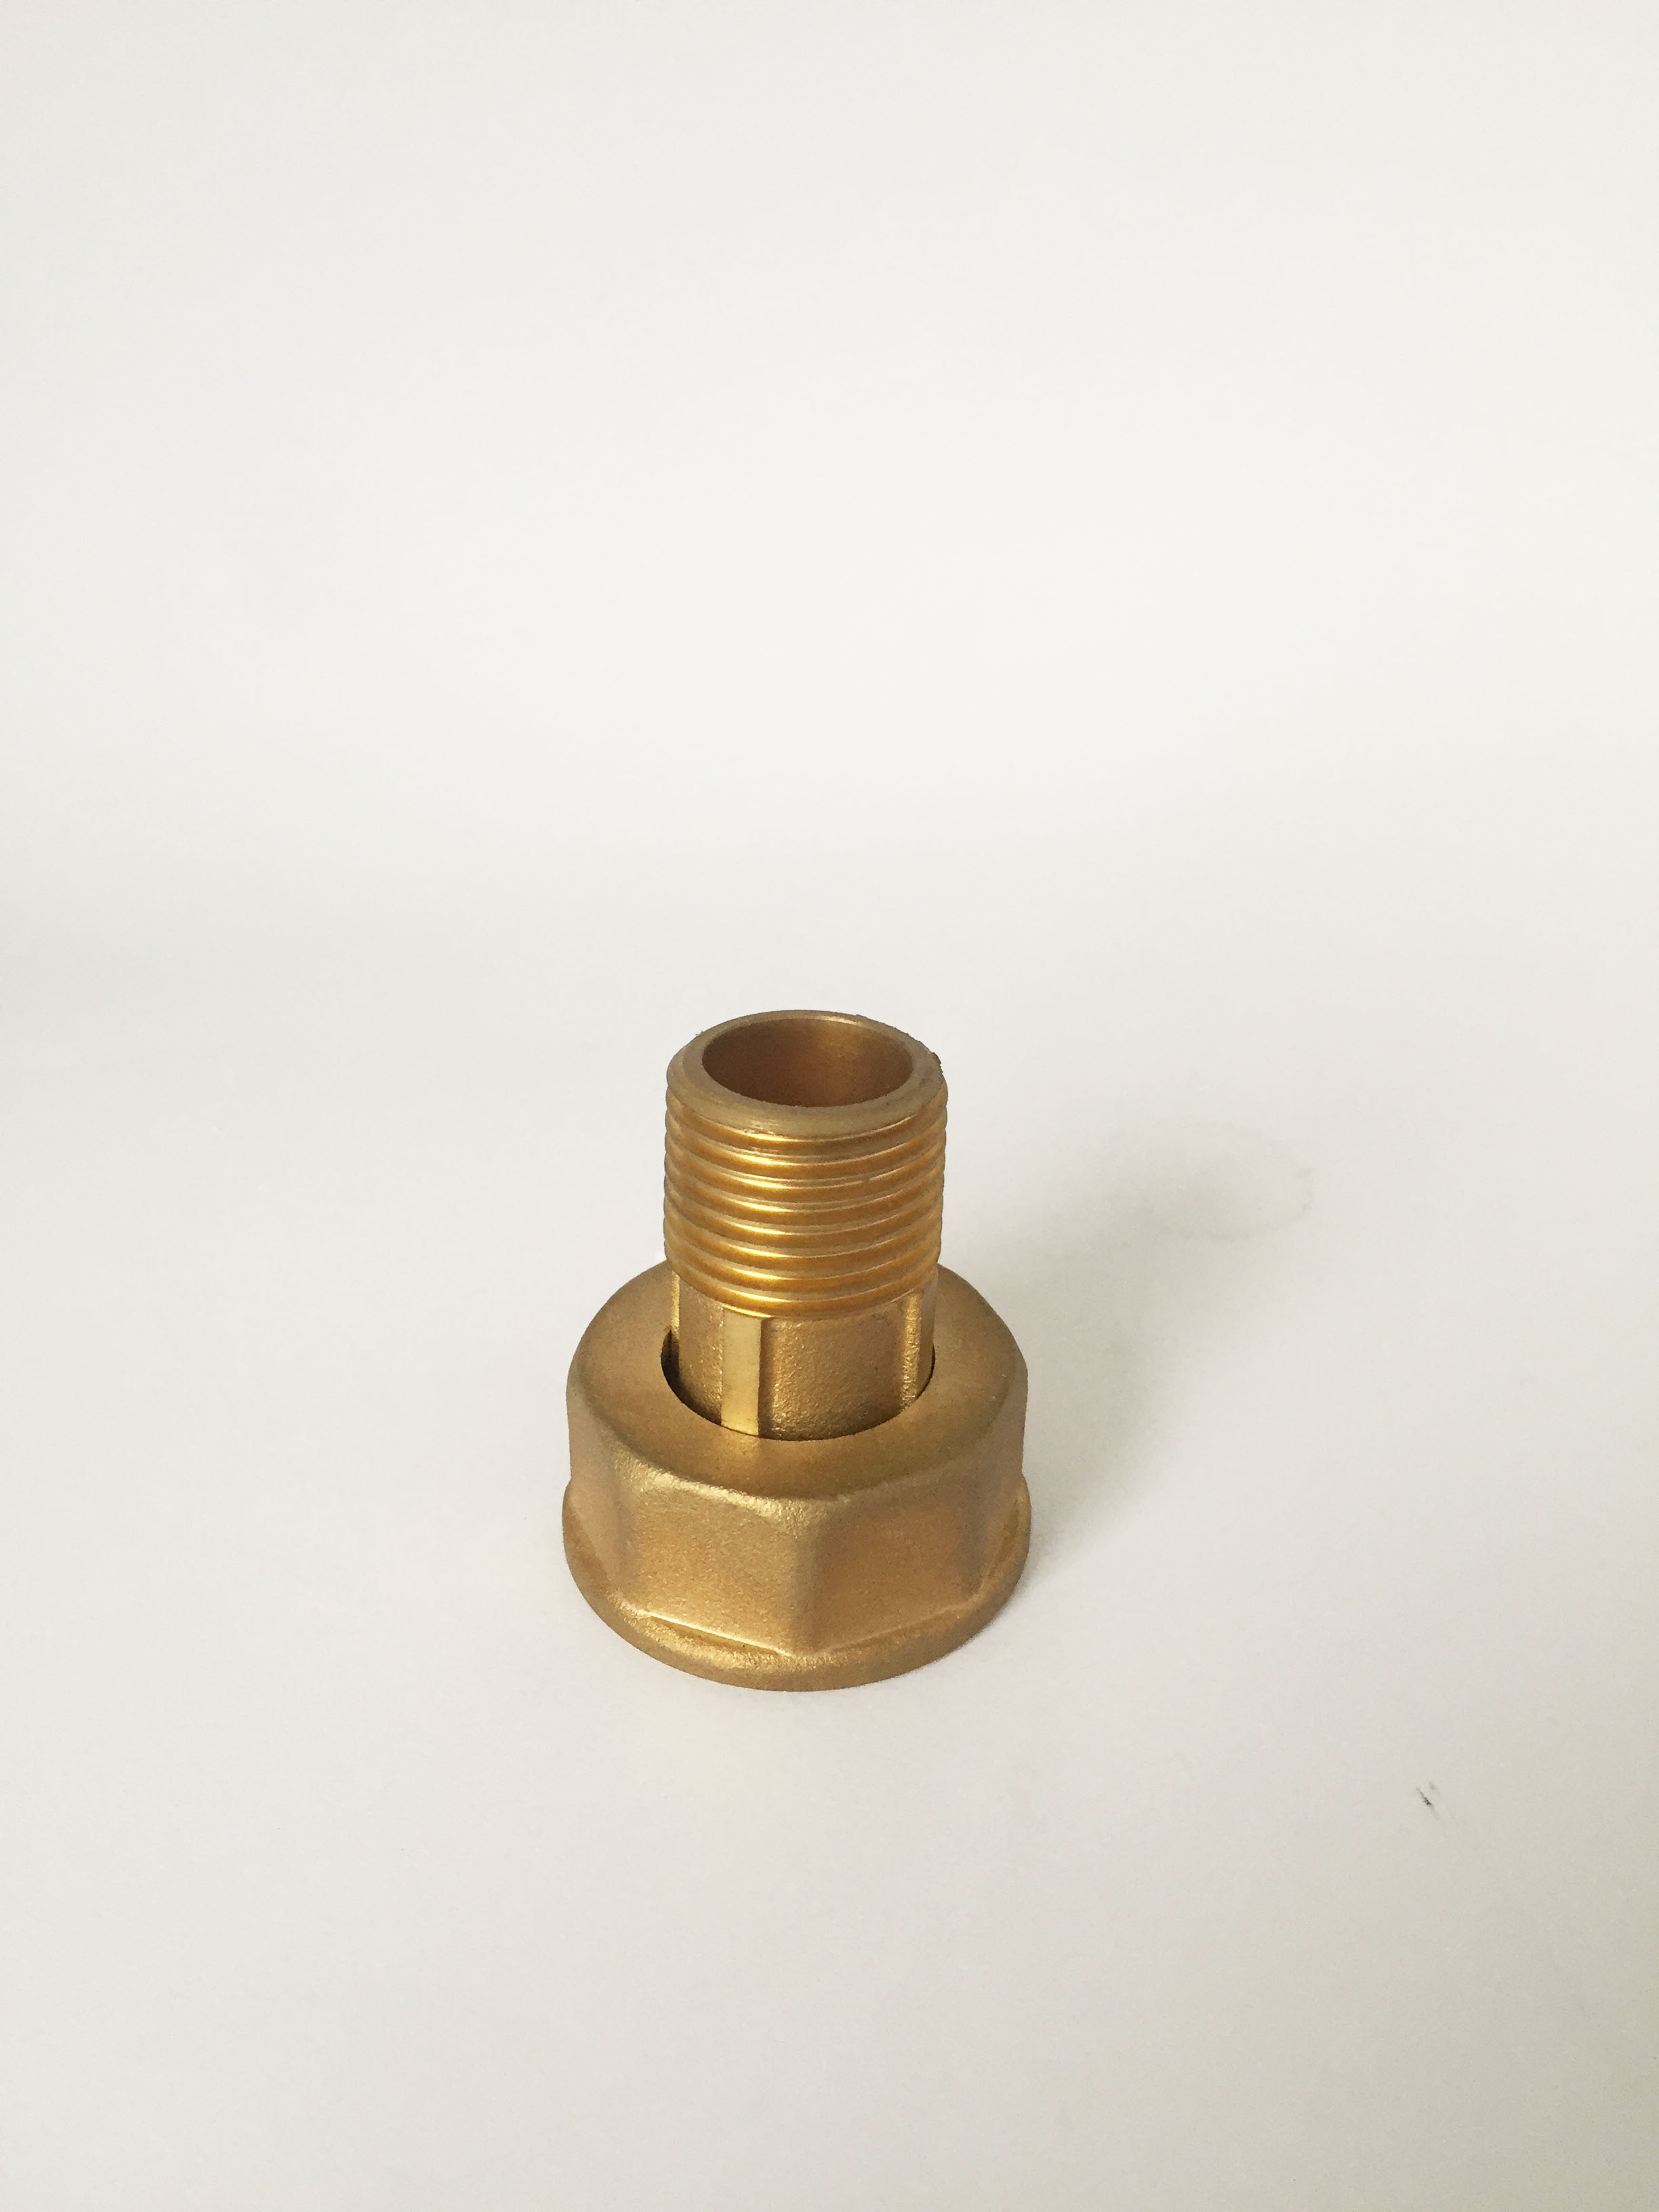 黄铜表接头R1/2